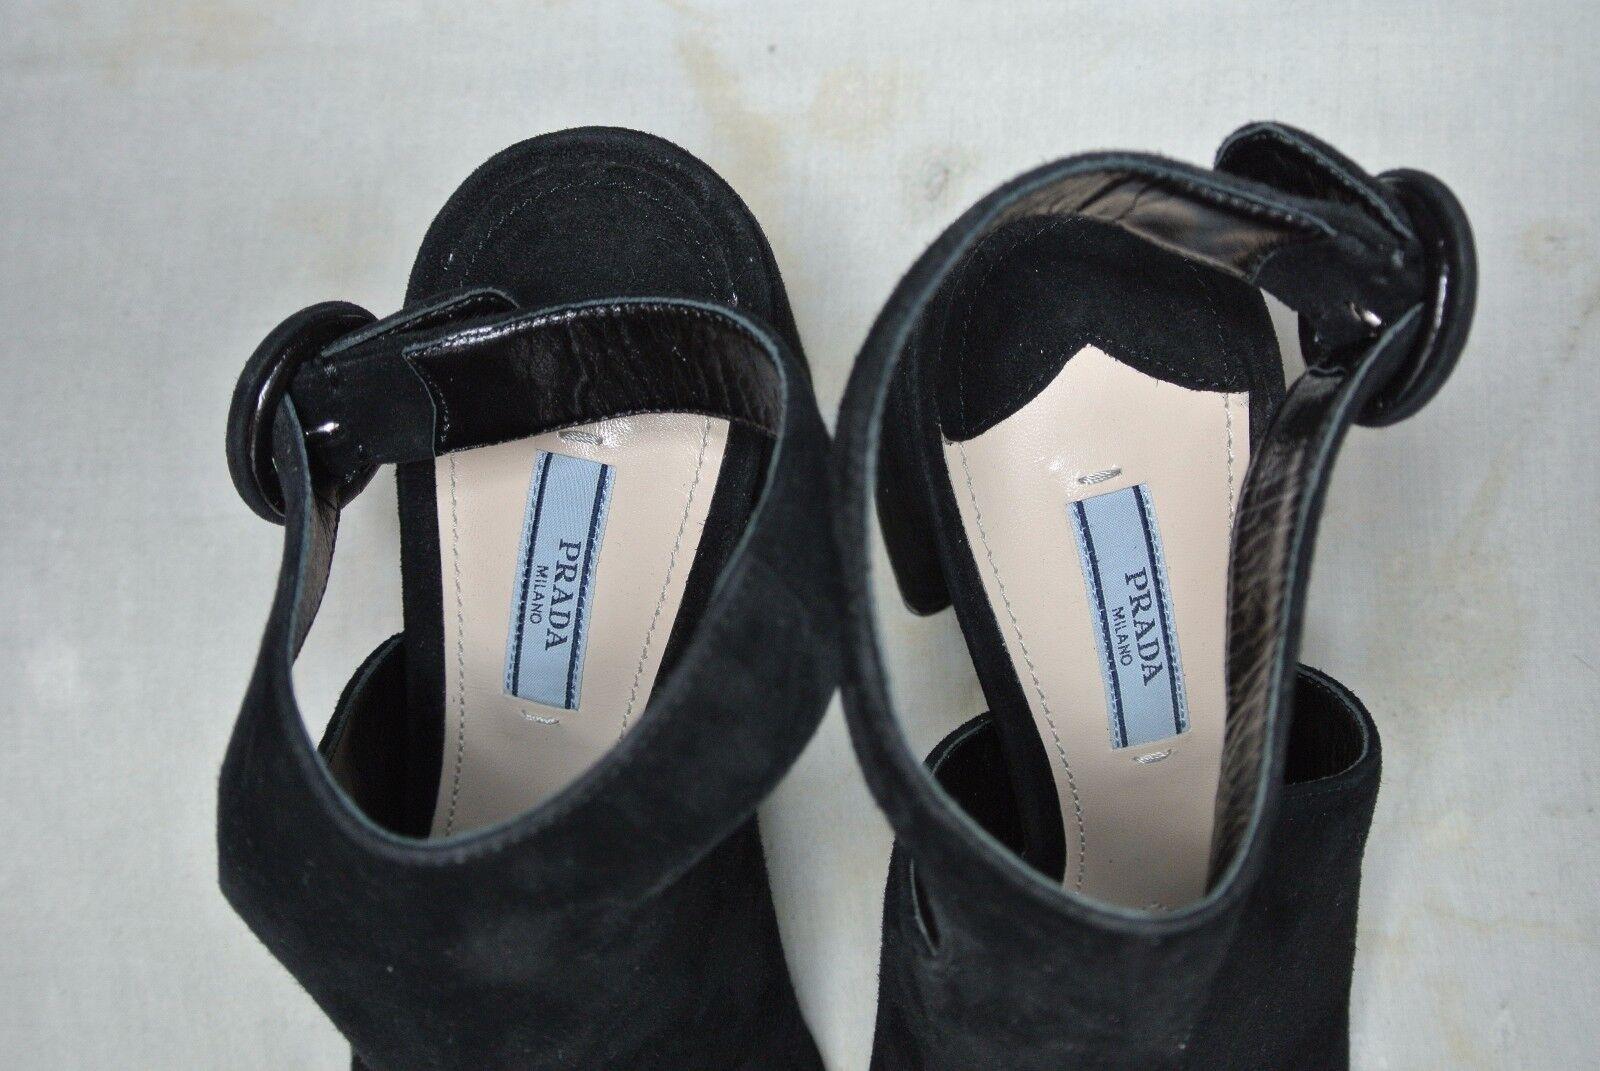 NEW NEW NEW w o Box Prada Cutout Suede Peep Toe Platform Sandals- Black US 9.5  890 68fa4c